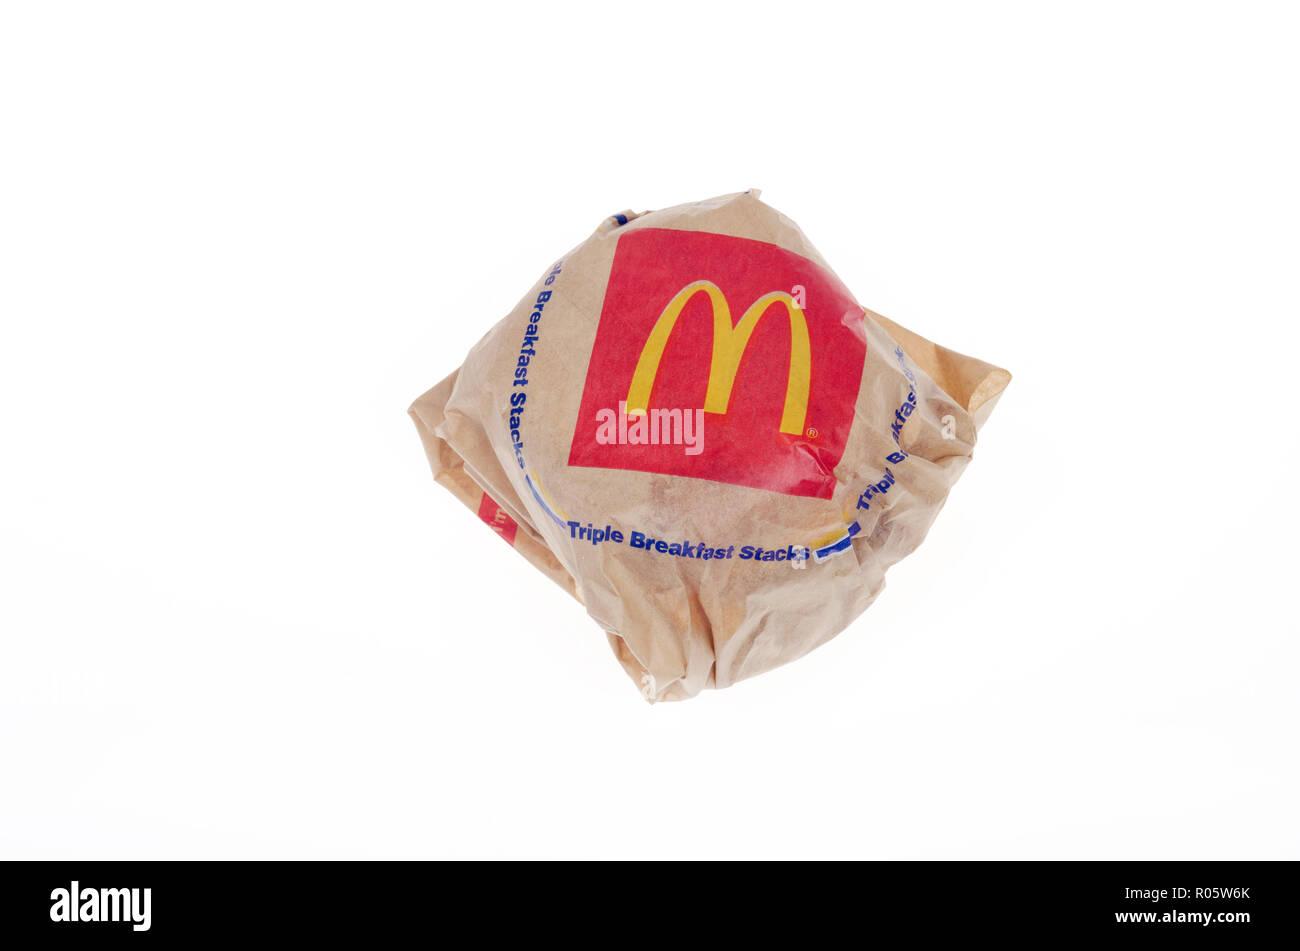 Mcdonalds Menu Breakfast Stock Photos & Mcdonalds Menu Breakfast ...